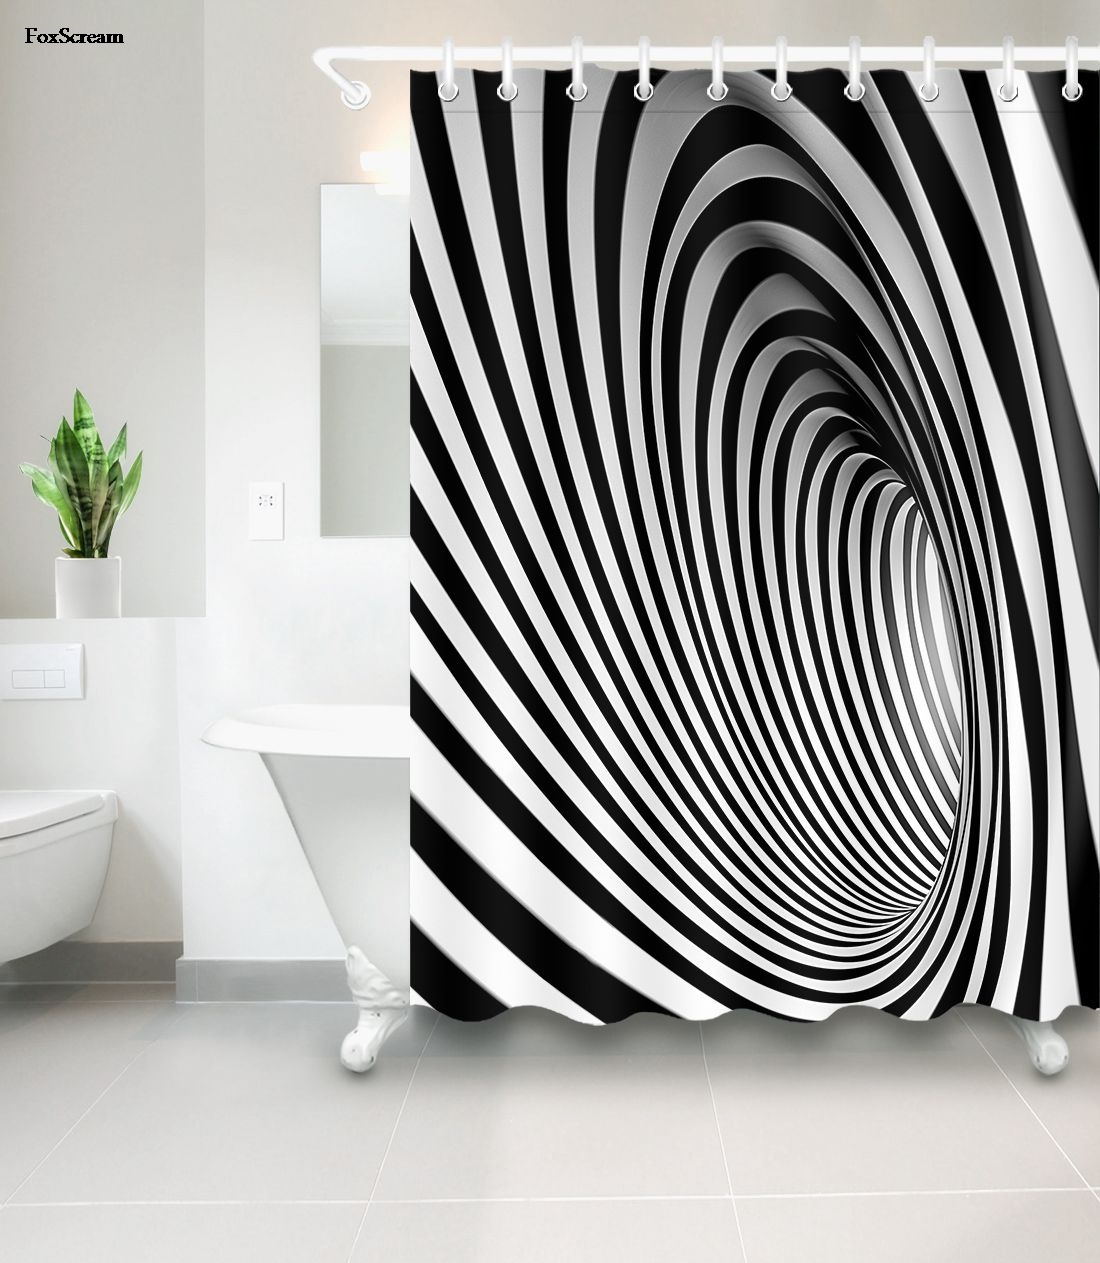 African Shower Curtain Bathroom Waterproof Cortinas Modern White Black Zebra Pattern Fashion Polyester